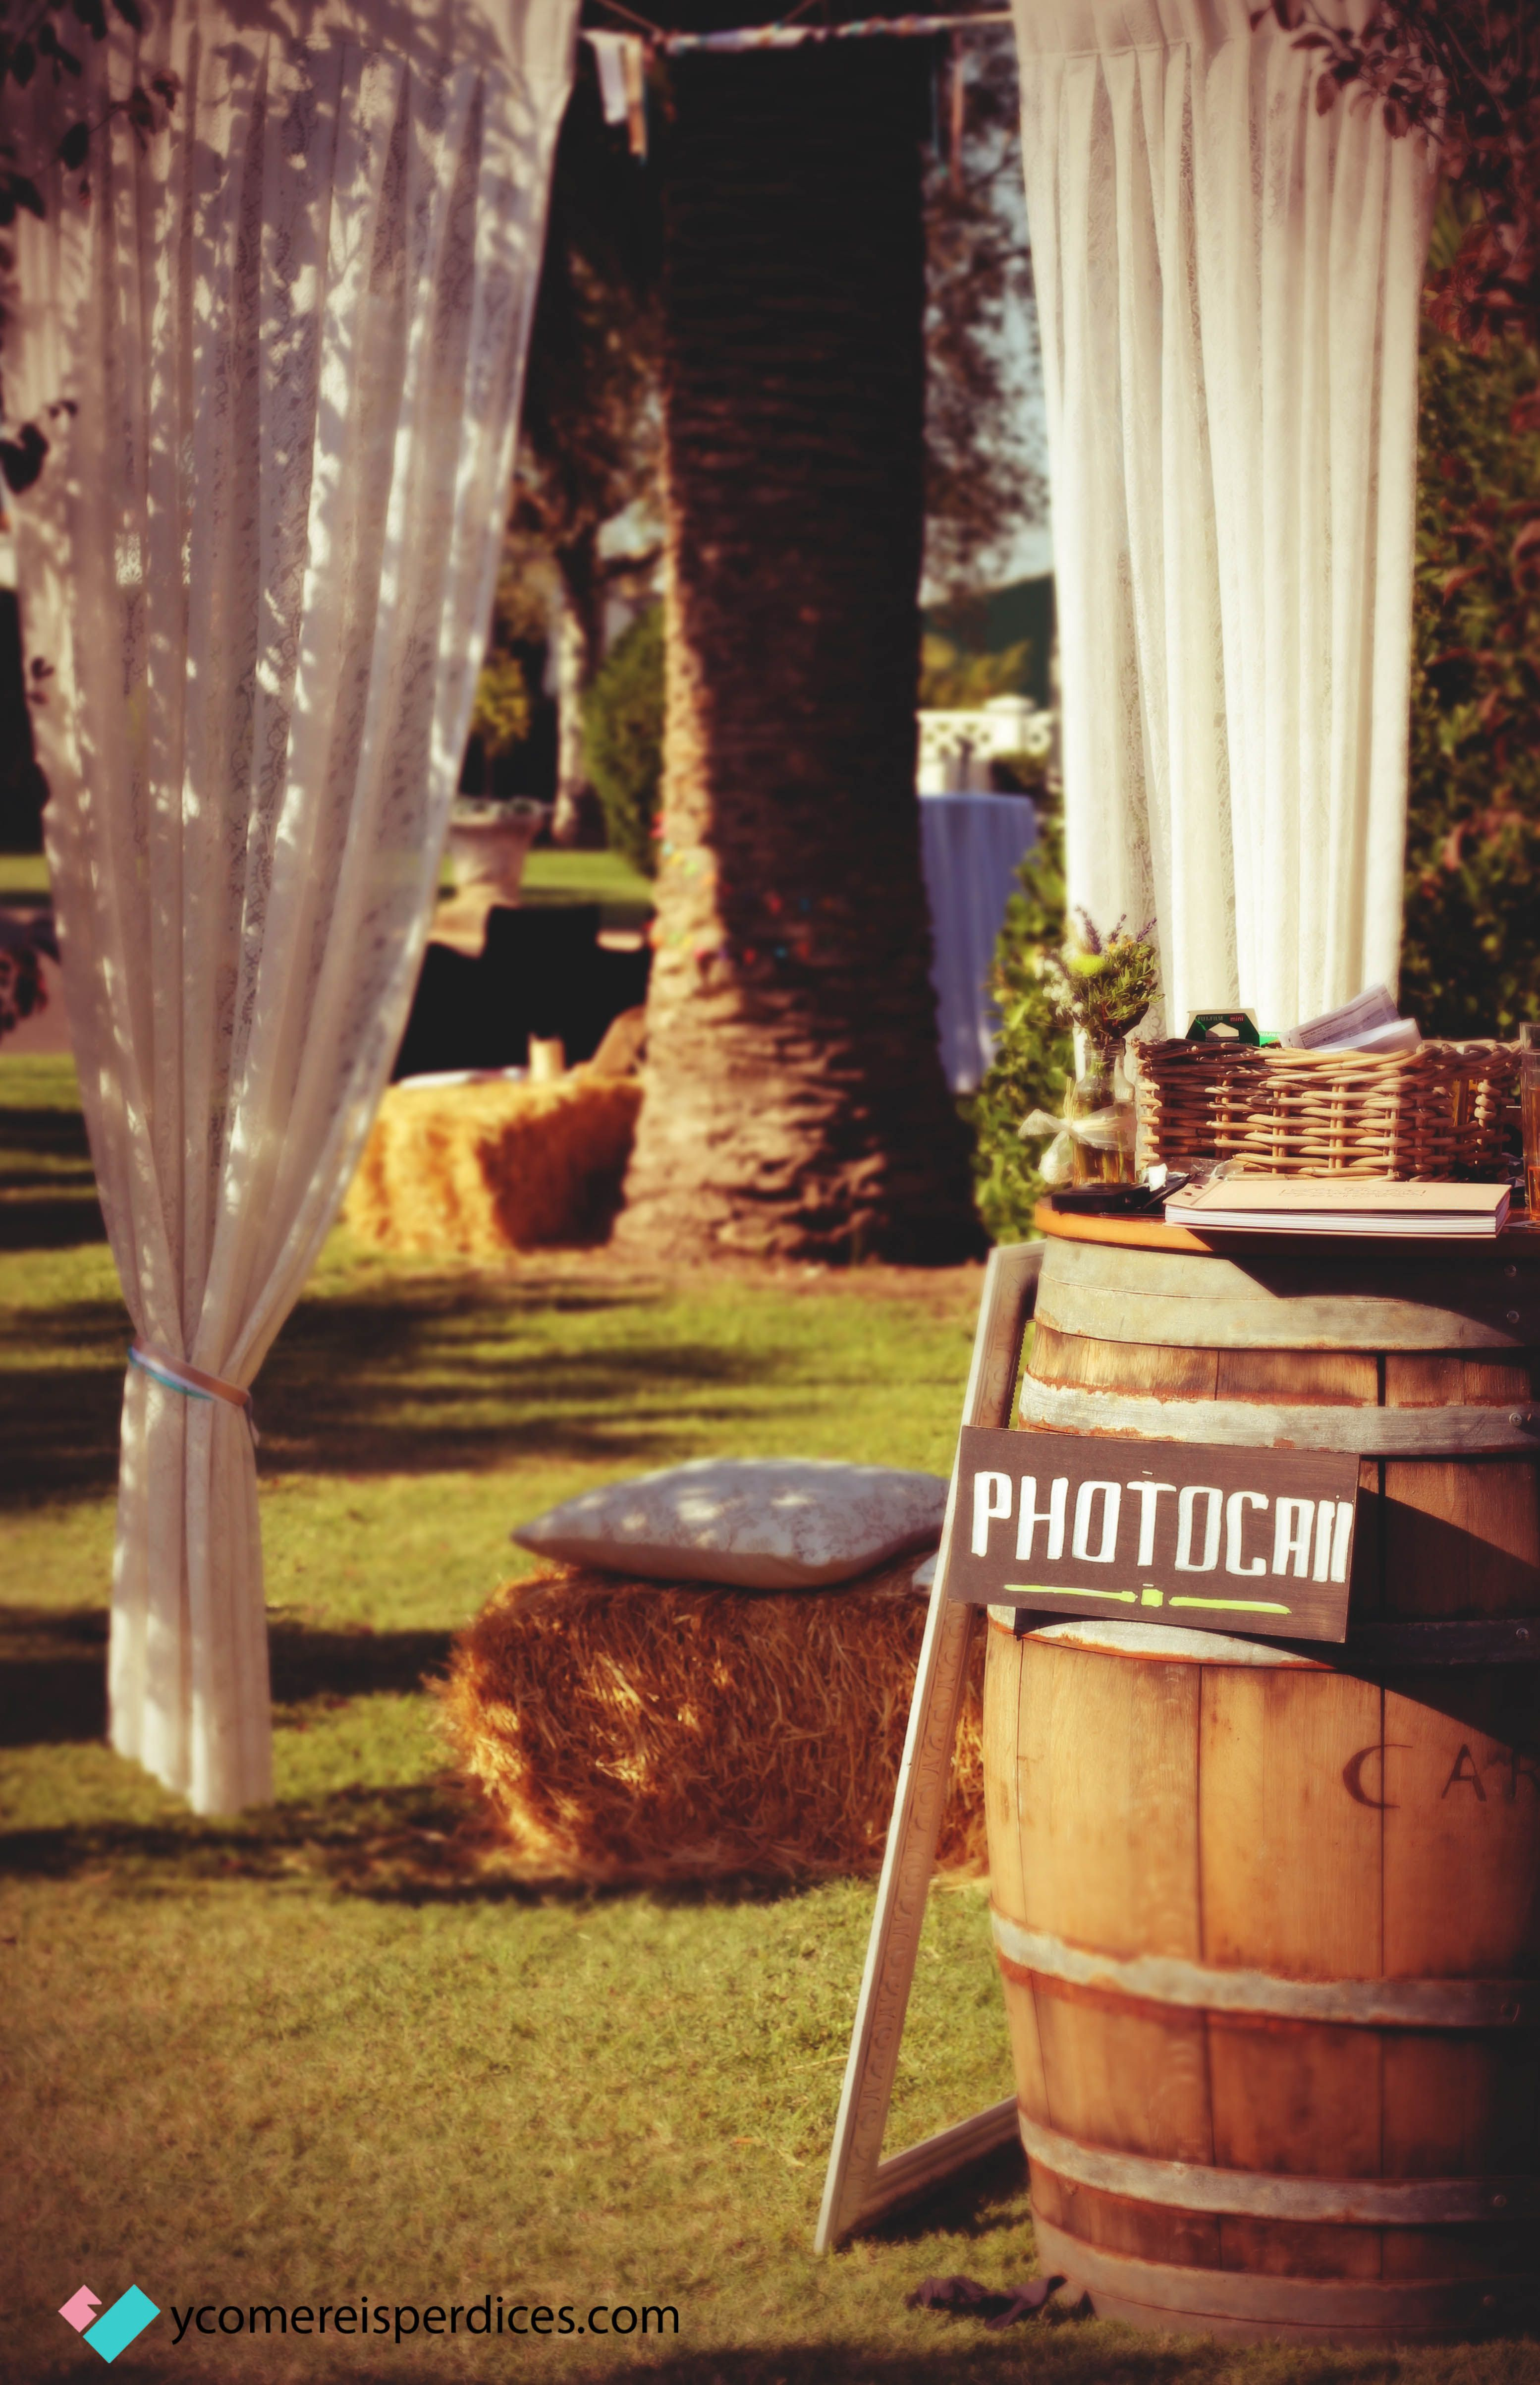 Photocall en una boda rústica.